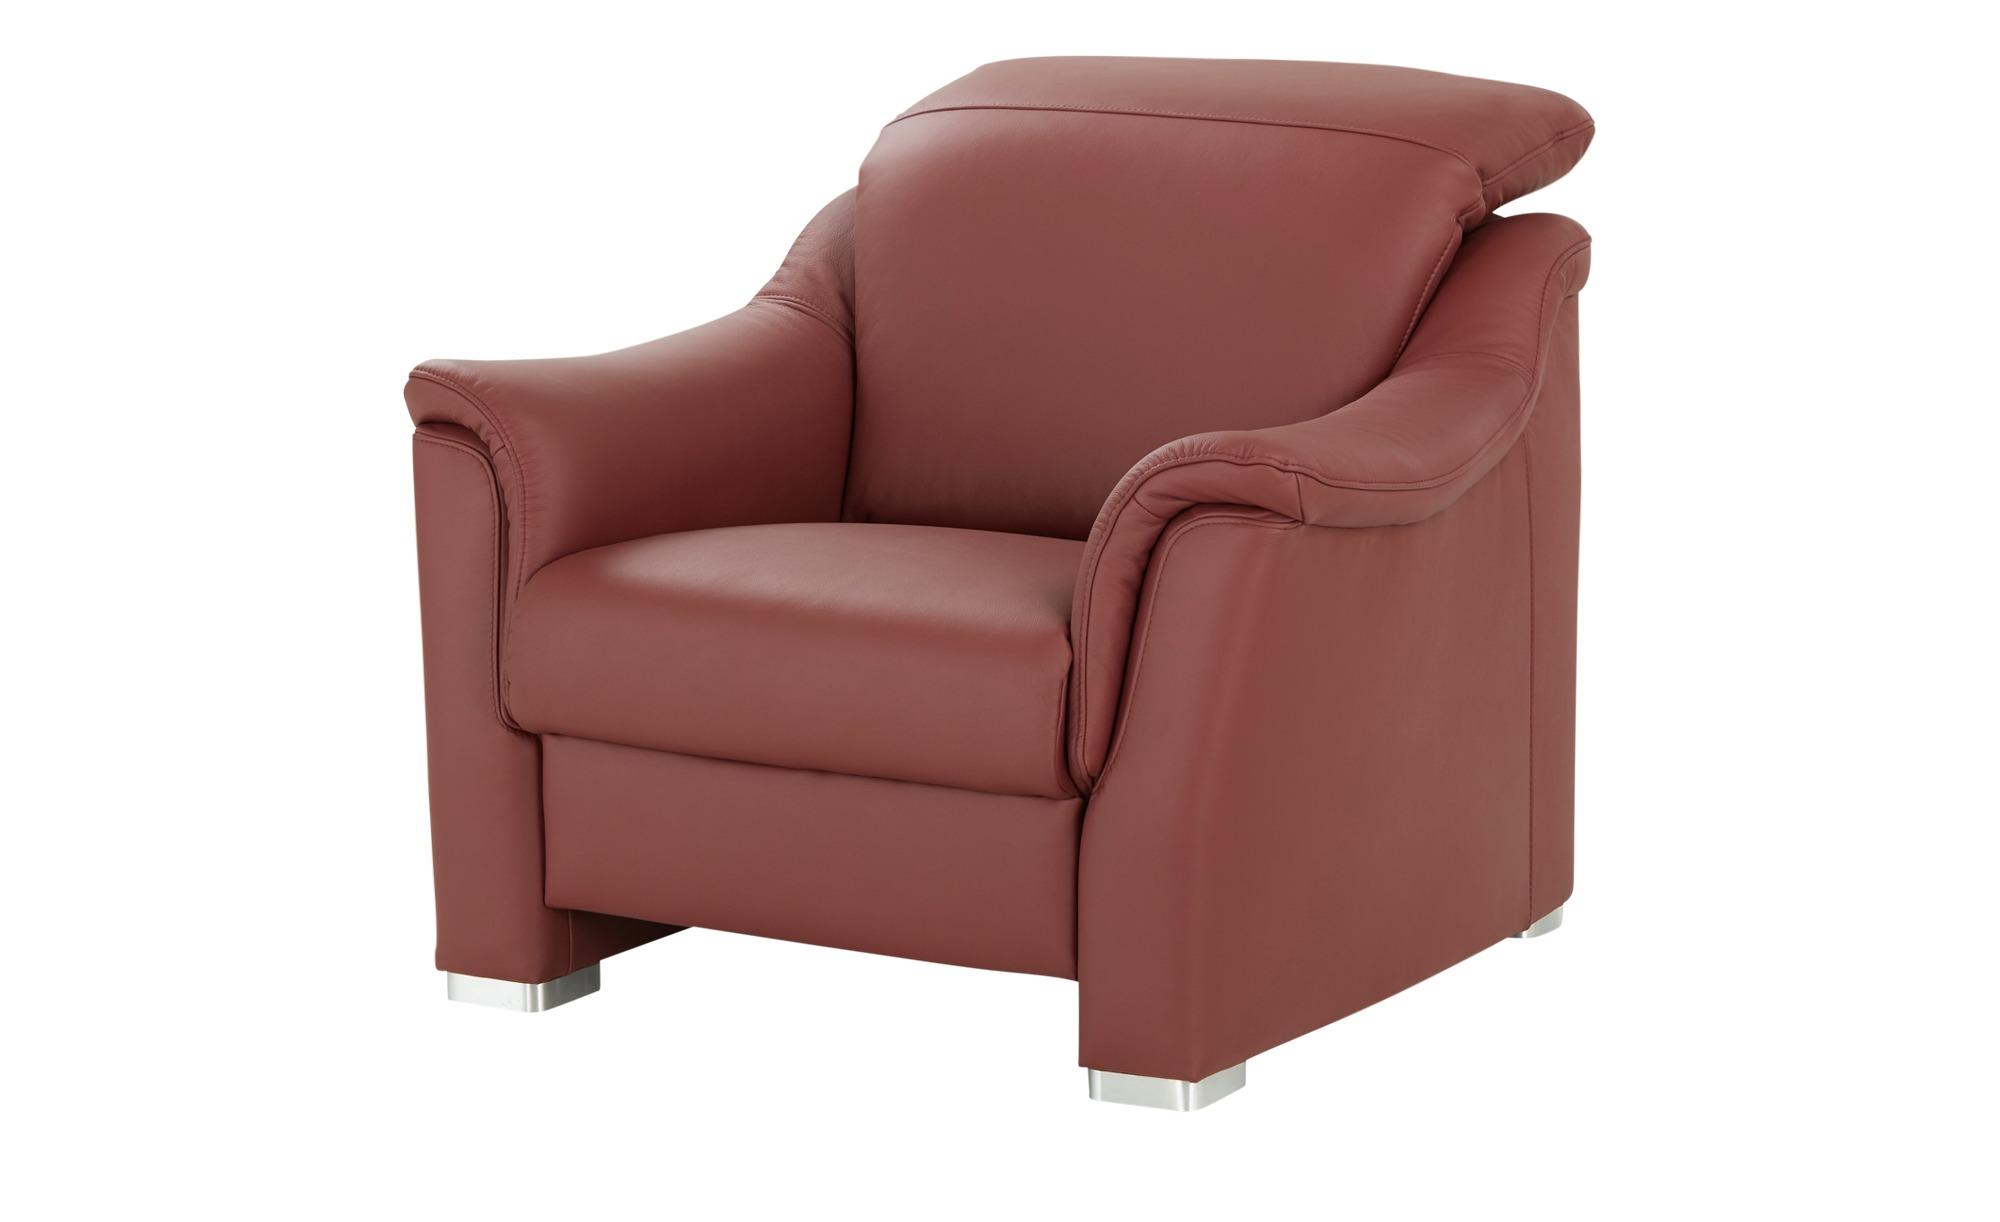 meinSofa Ledersessel  Desana ¦ rot ¦ Maße (cm): B: 102 H: 83 T: 102 Polstermöbel > Sessel > Ledersessel - Höffner